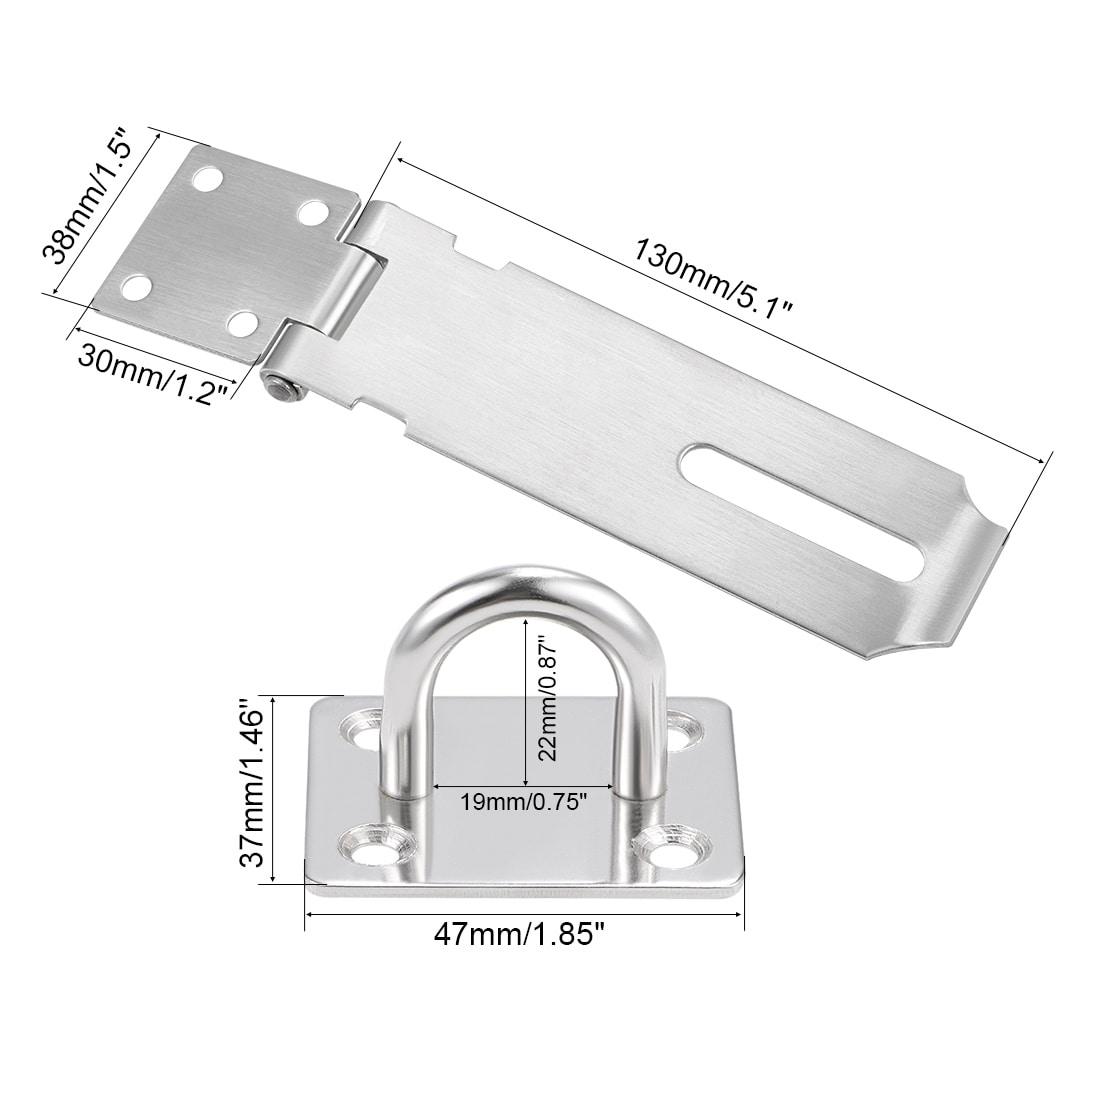 304 Stainless Steel Padlock Vertical Locking Hasp And Staple Door Cabinet Lock